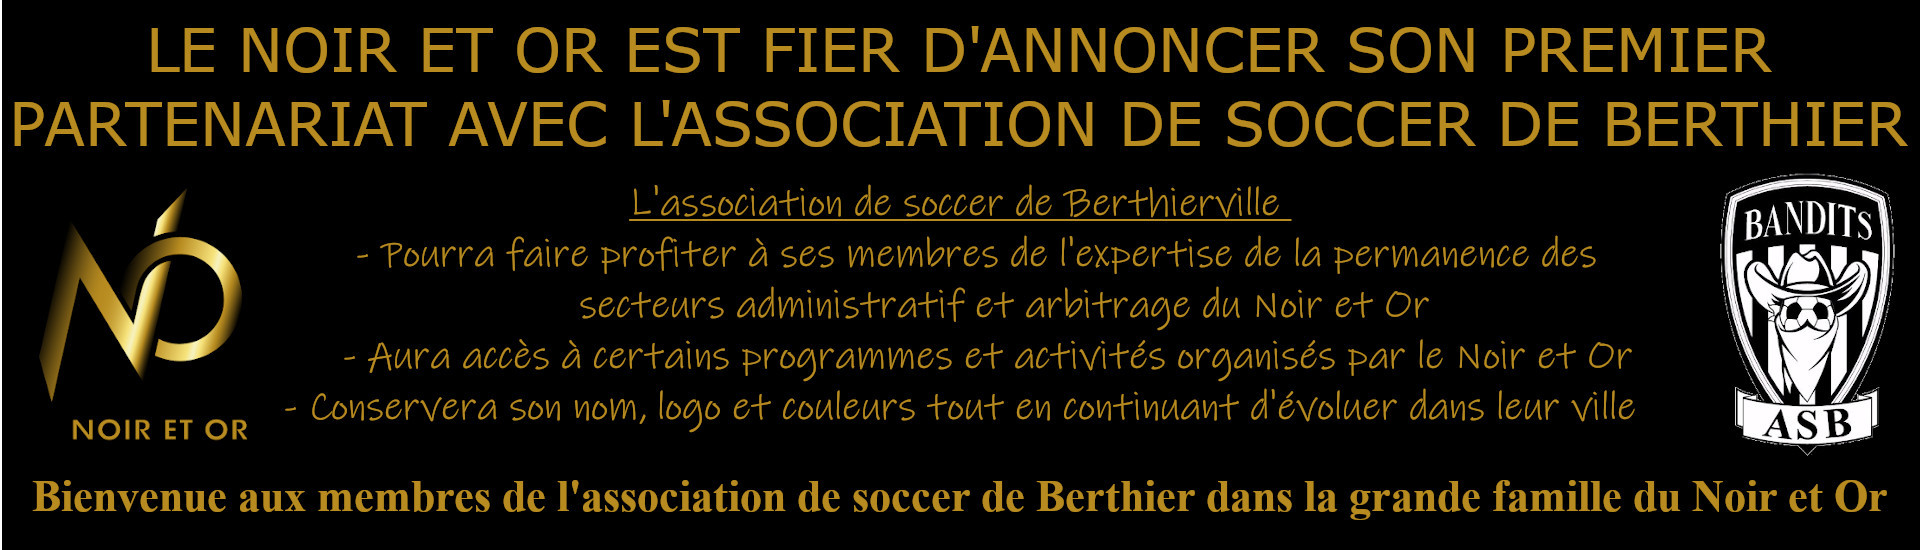 Partenariat avec l'Association de soccer de Berthier